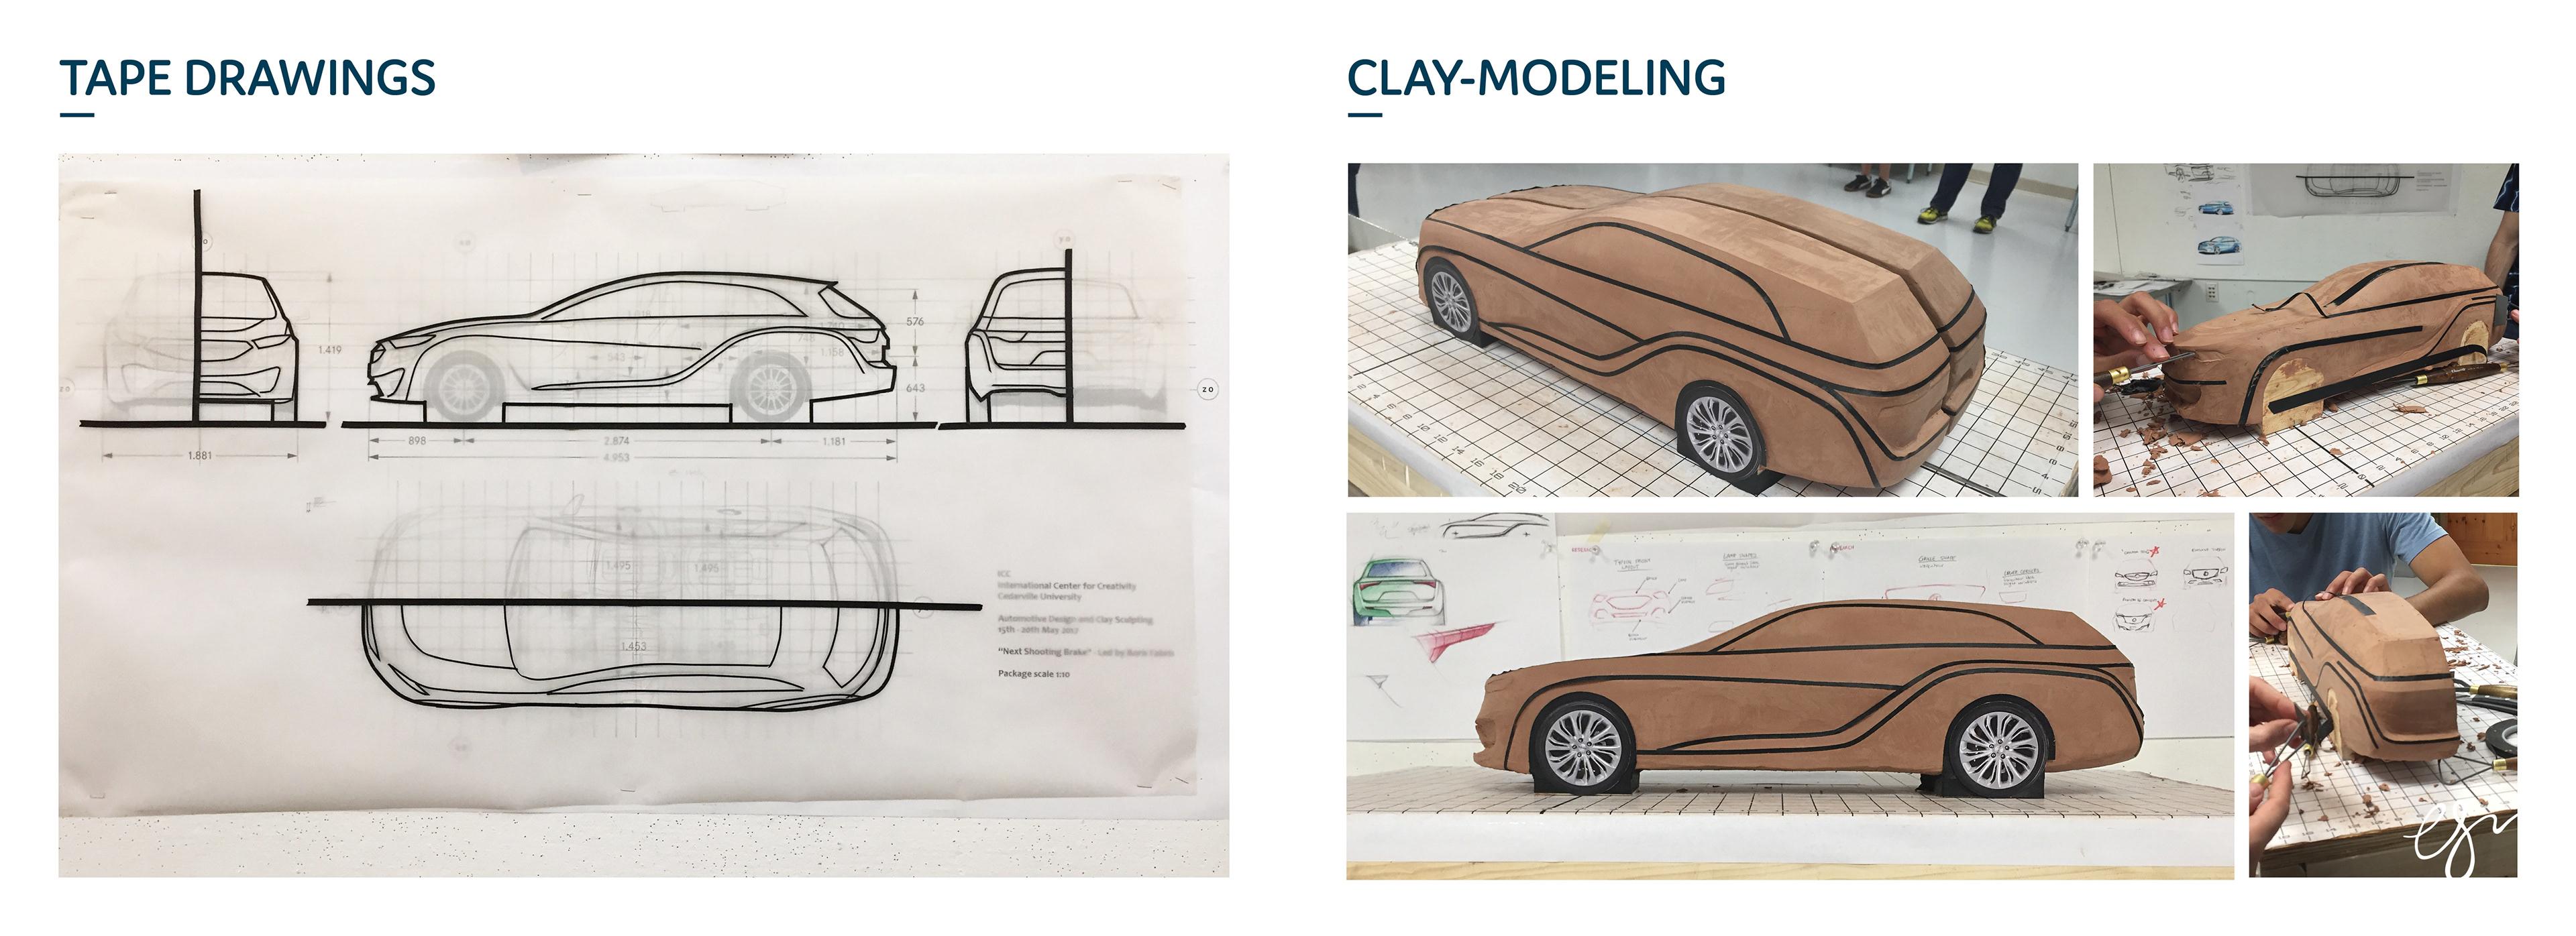 Amy Sririntrachai - Buick Shooting Brake Concept - Clay Modeling